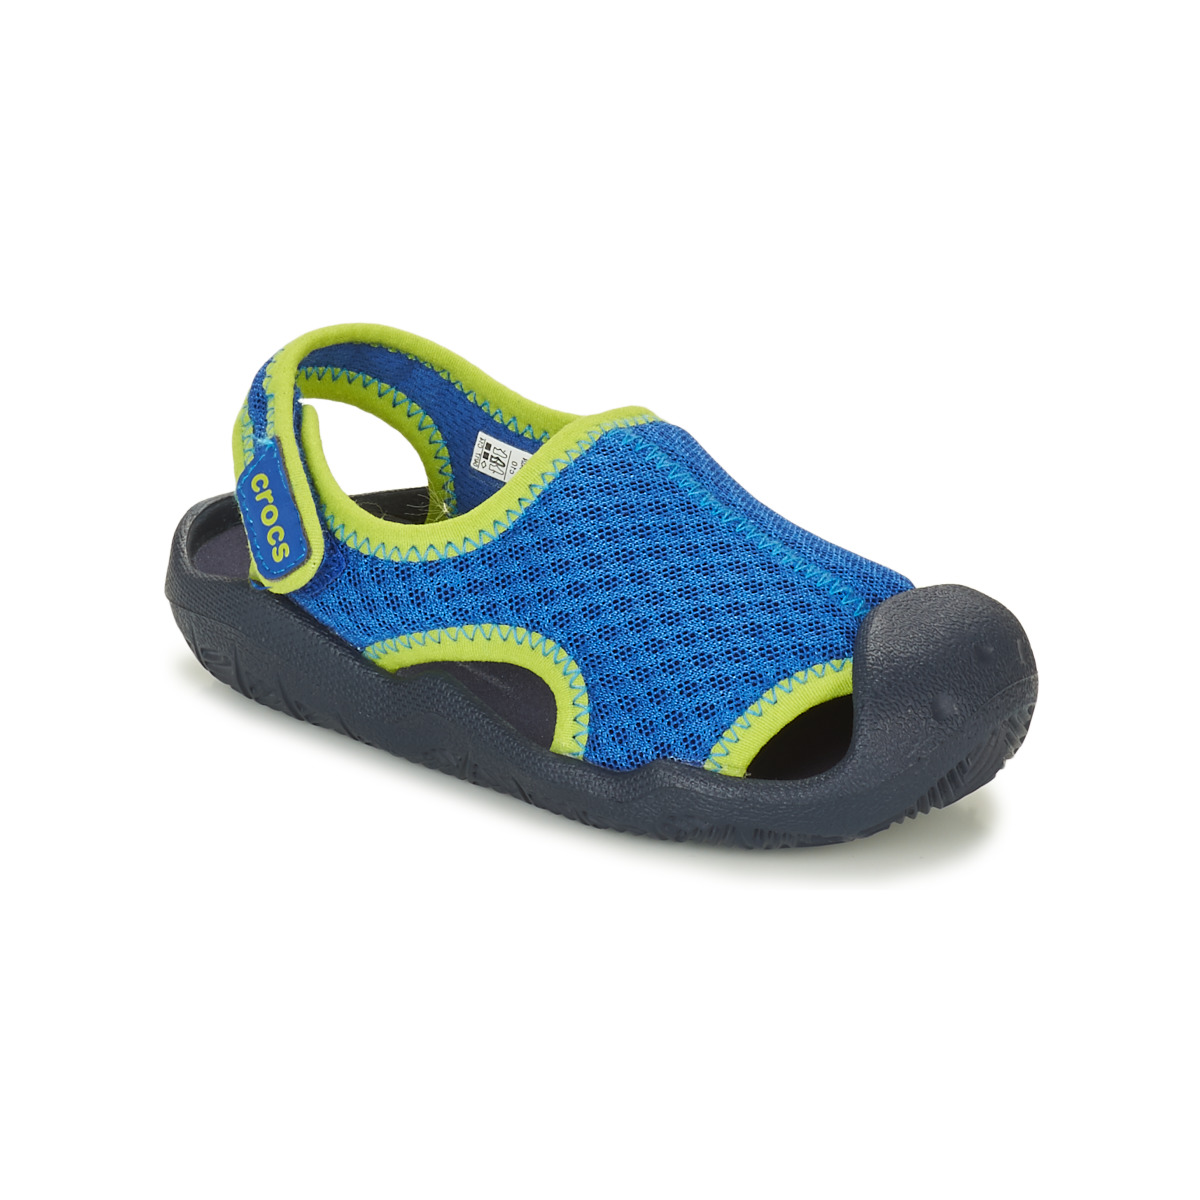 ... Crocs Sandále SWIFTWATER SANDAL K Crocs. -5% Nové ... 9294f9c960